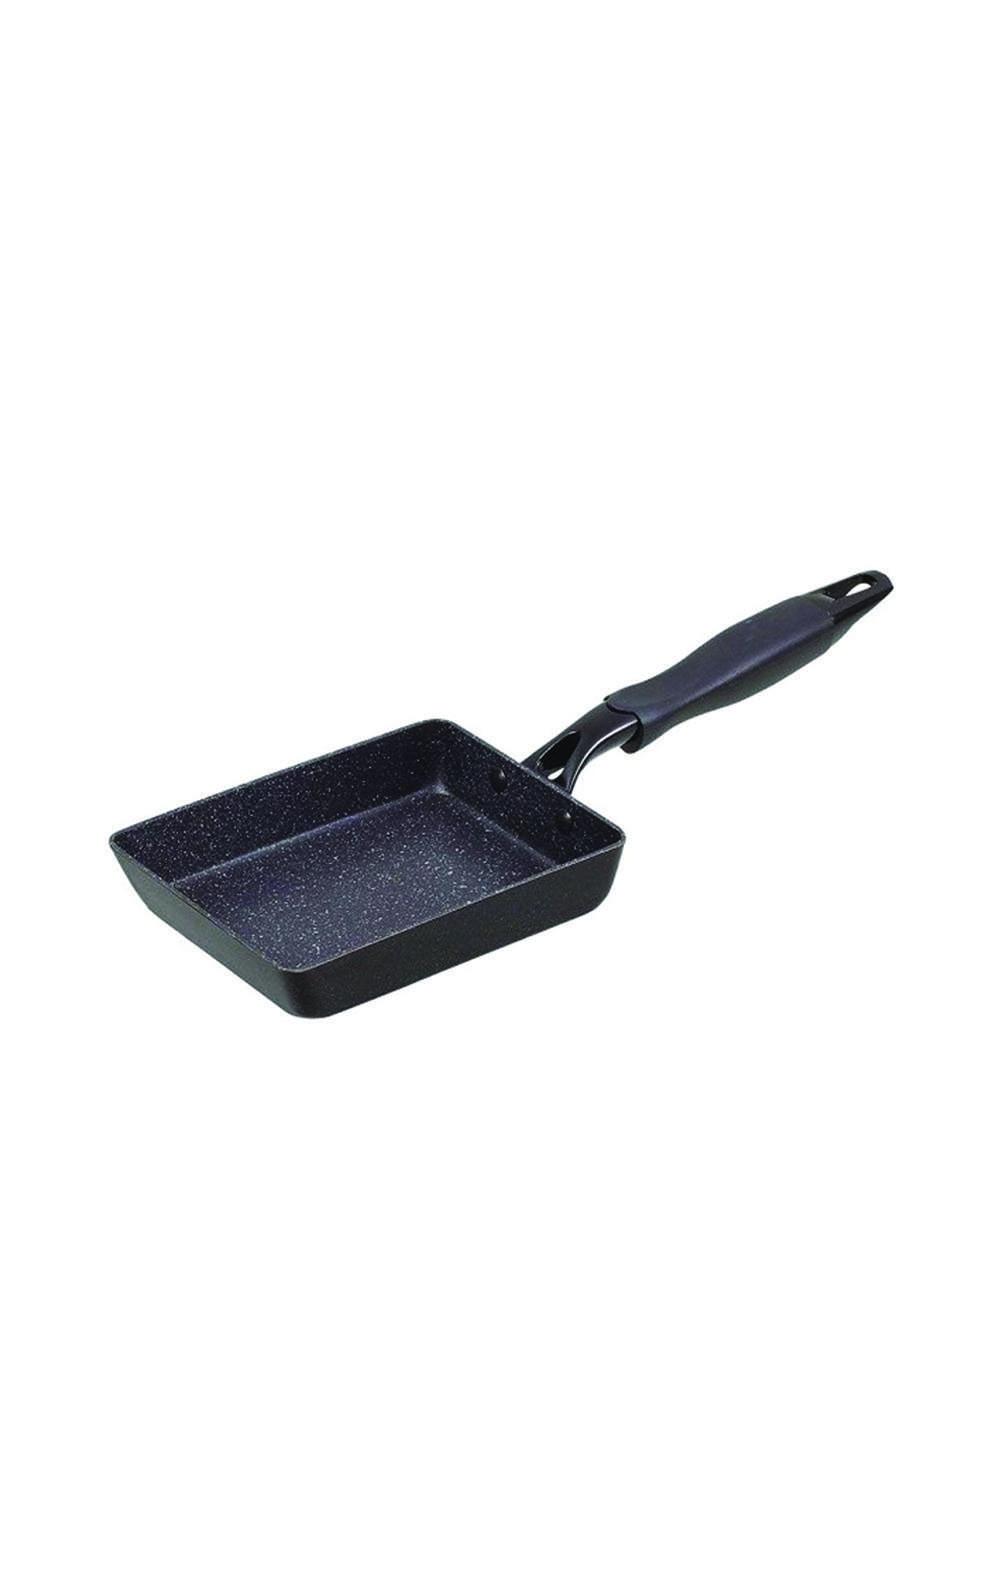 Pearl Metal HB-3888 Marble Fan Teflon Select Processing 13 × 18cm-Black مقلاة مربعة الشكل